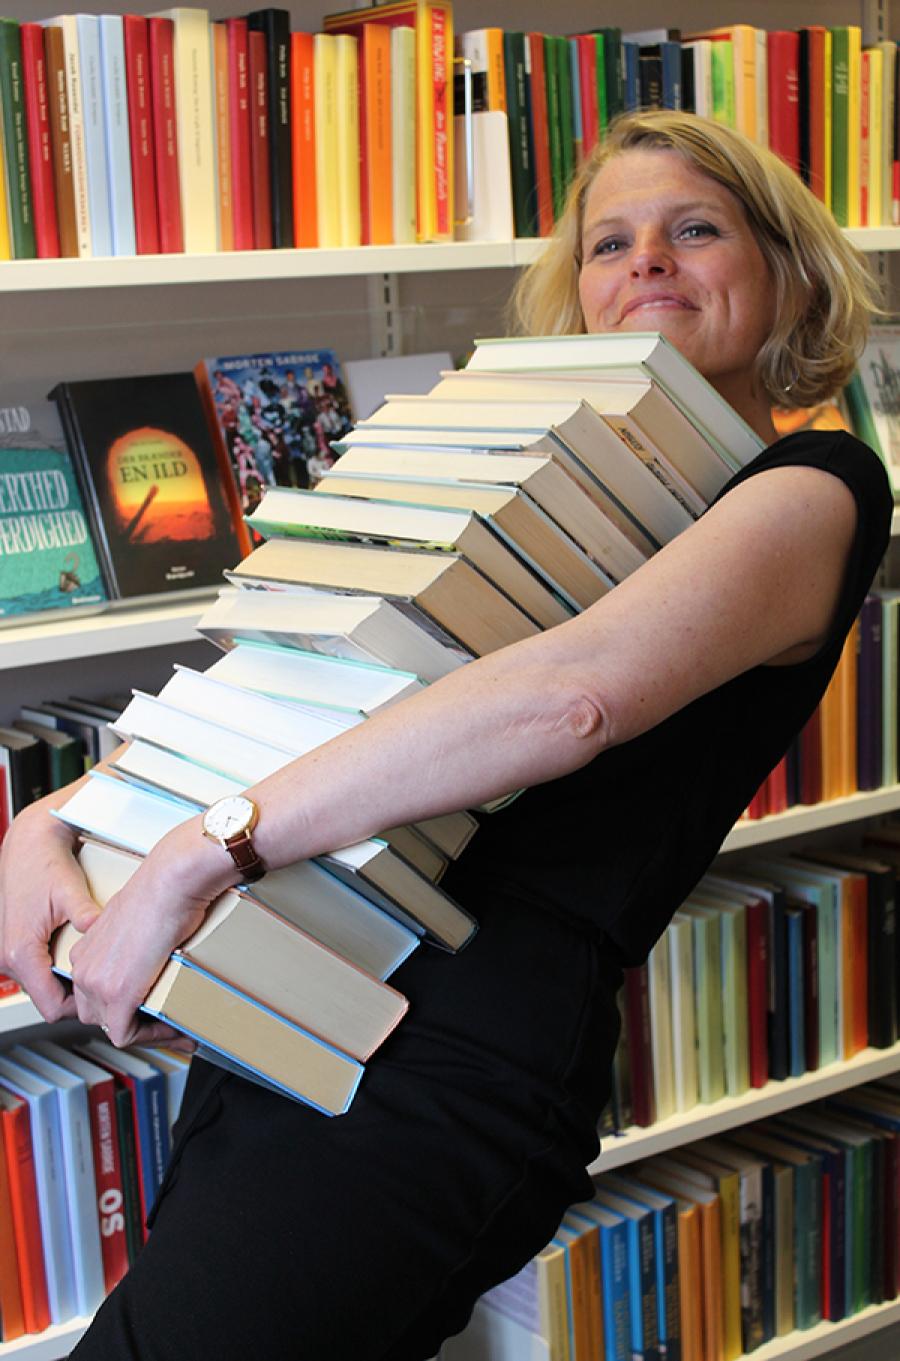 Bibliotekar Randi Peteresen